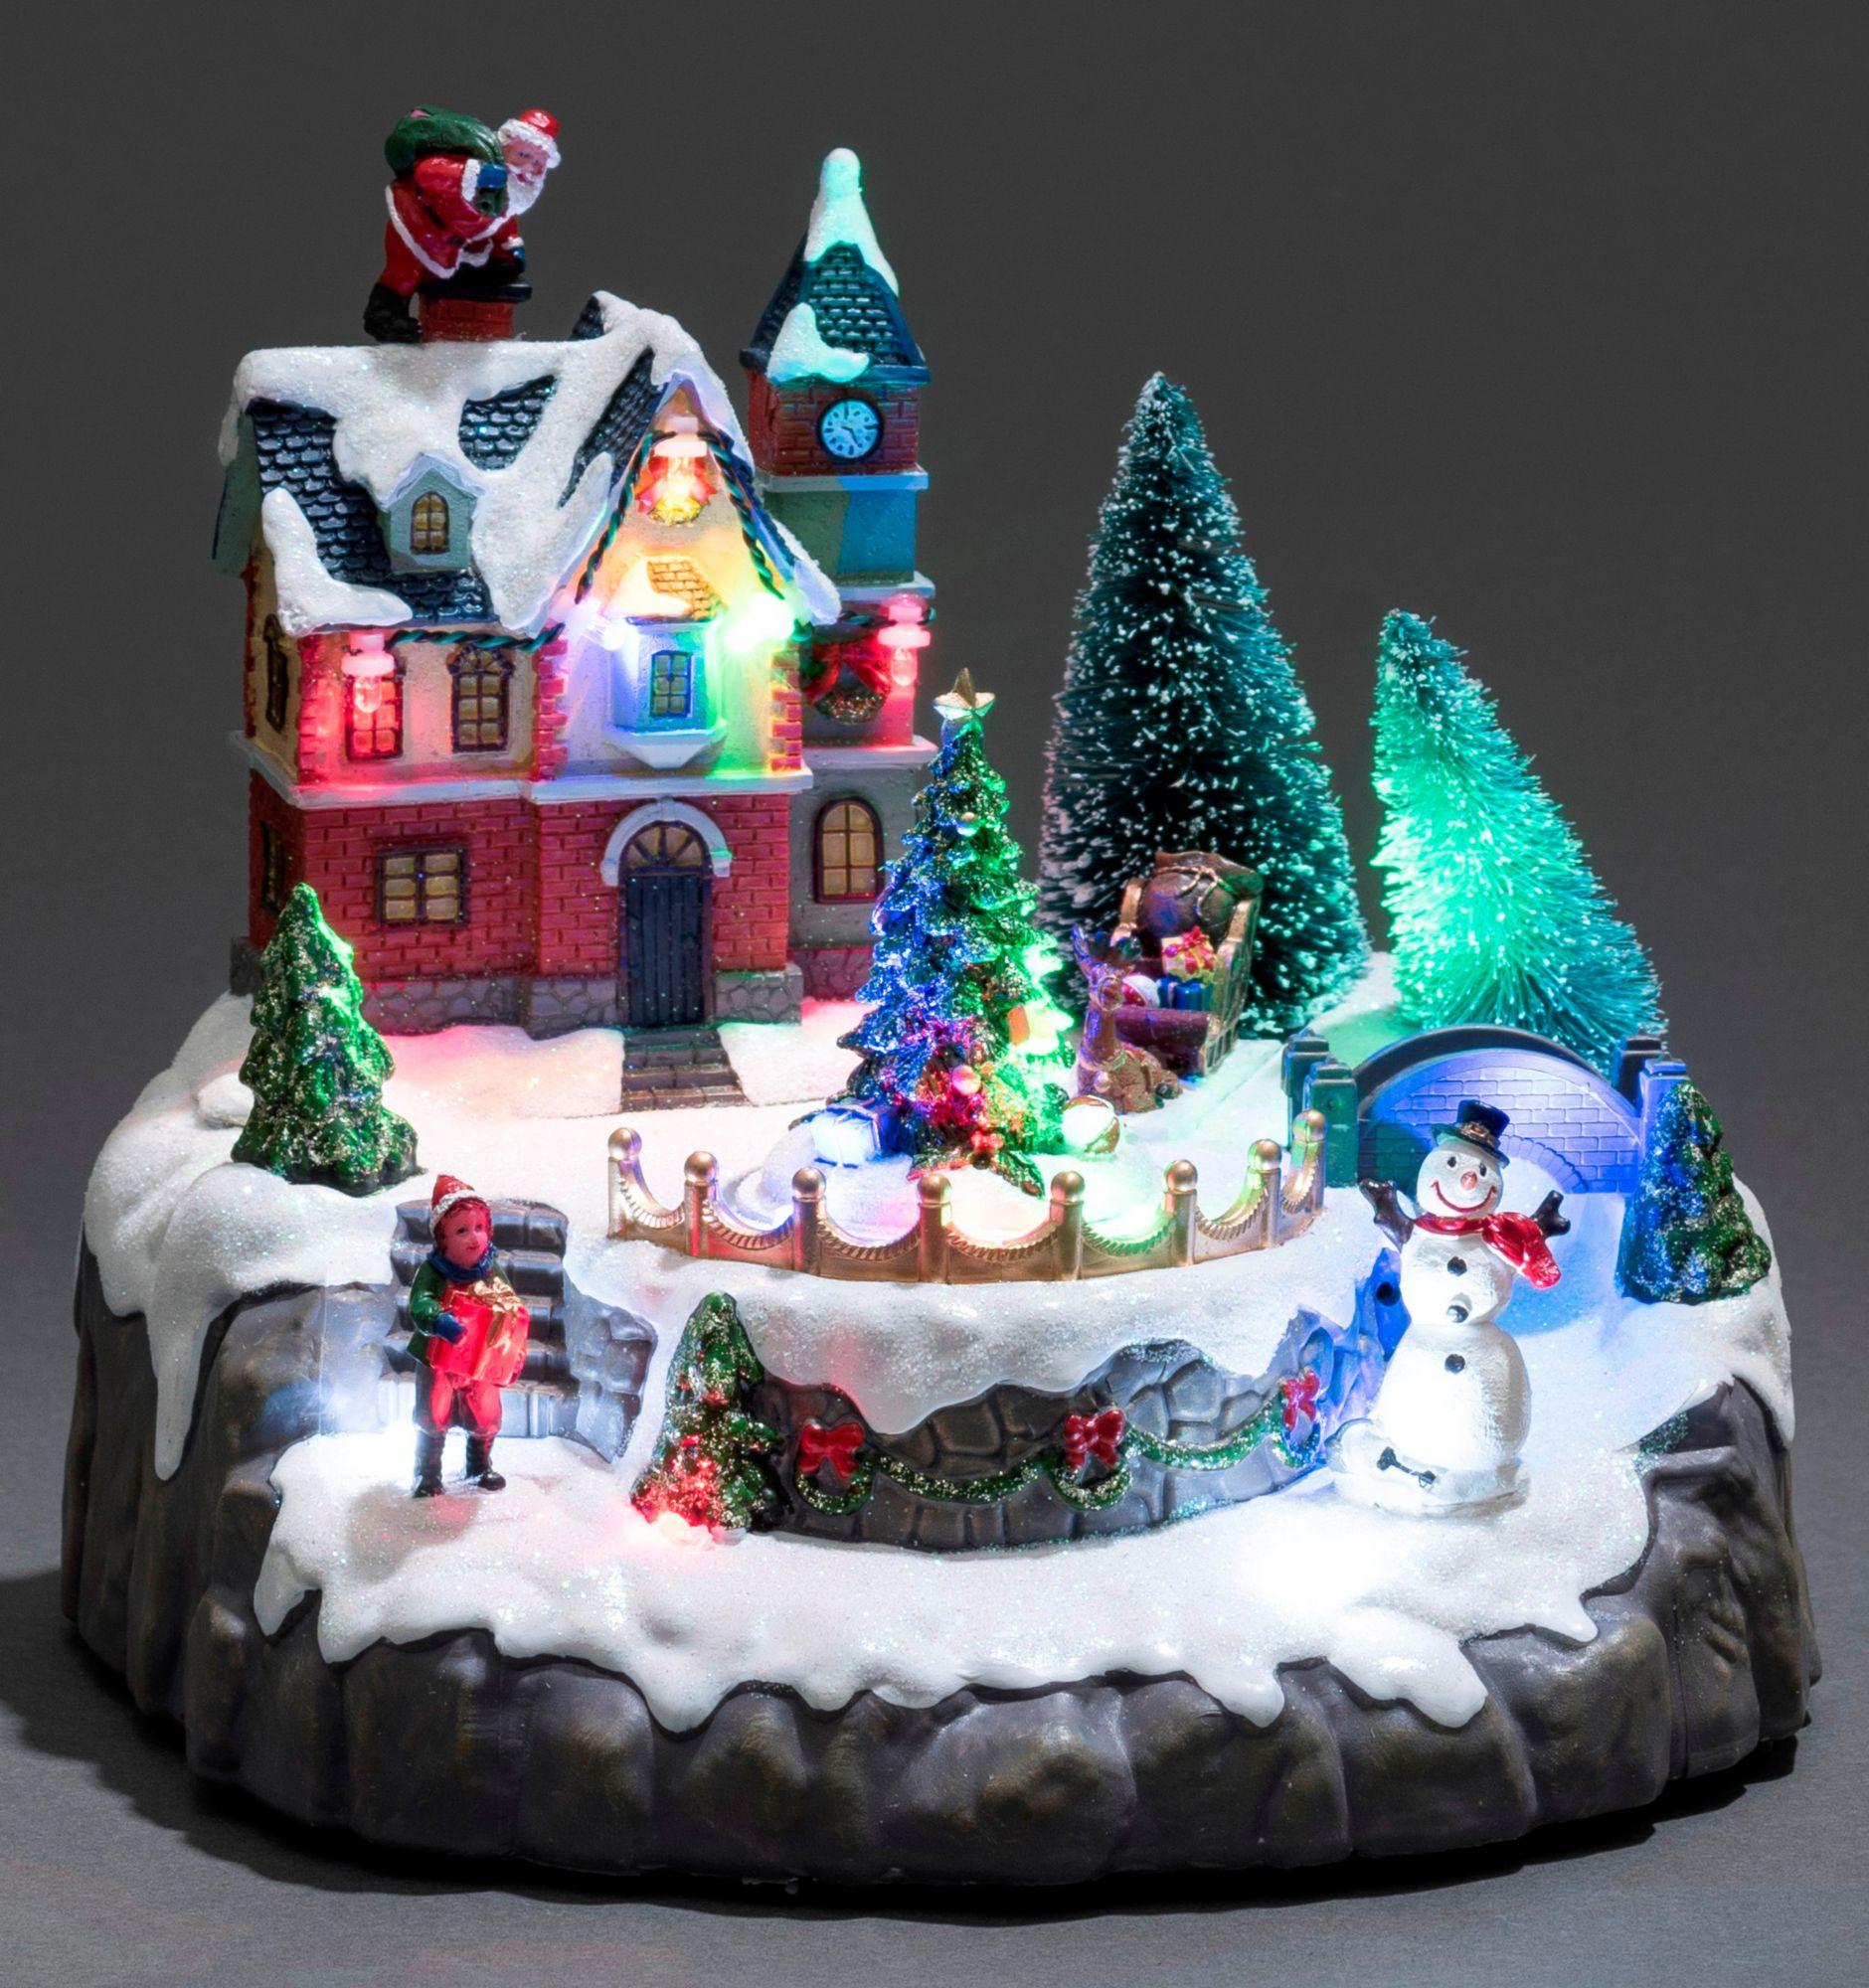 KONSTSMIDE Konstsmide LED Szenerie, »Wohnhaus mit Weihnachtsbäumen«